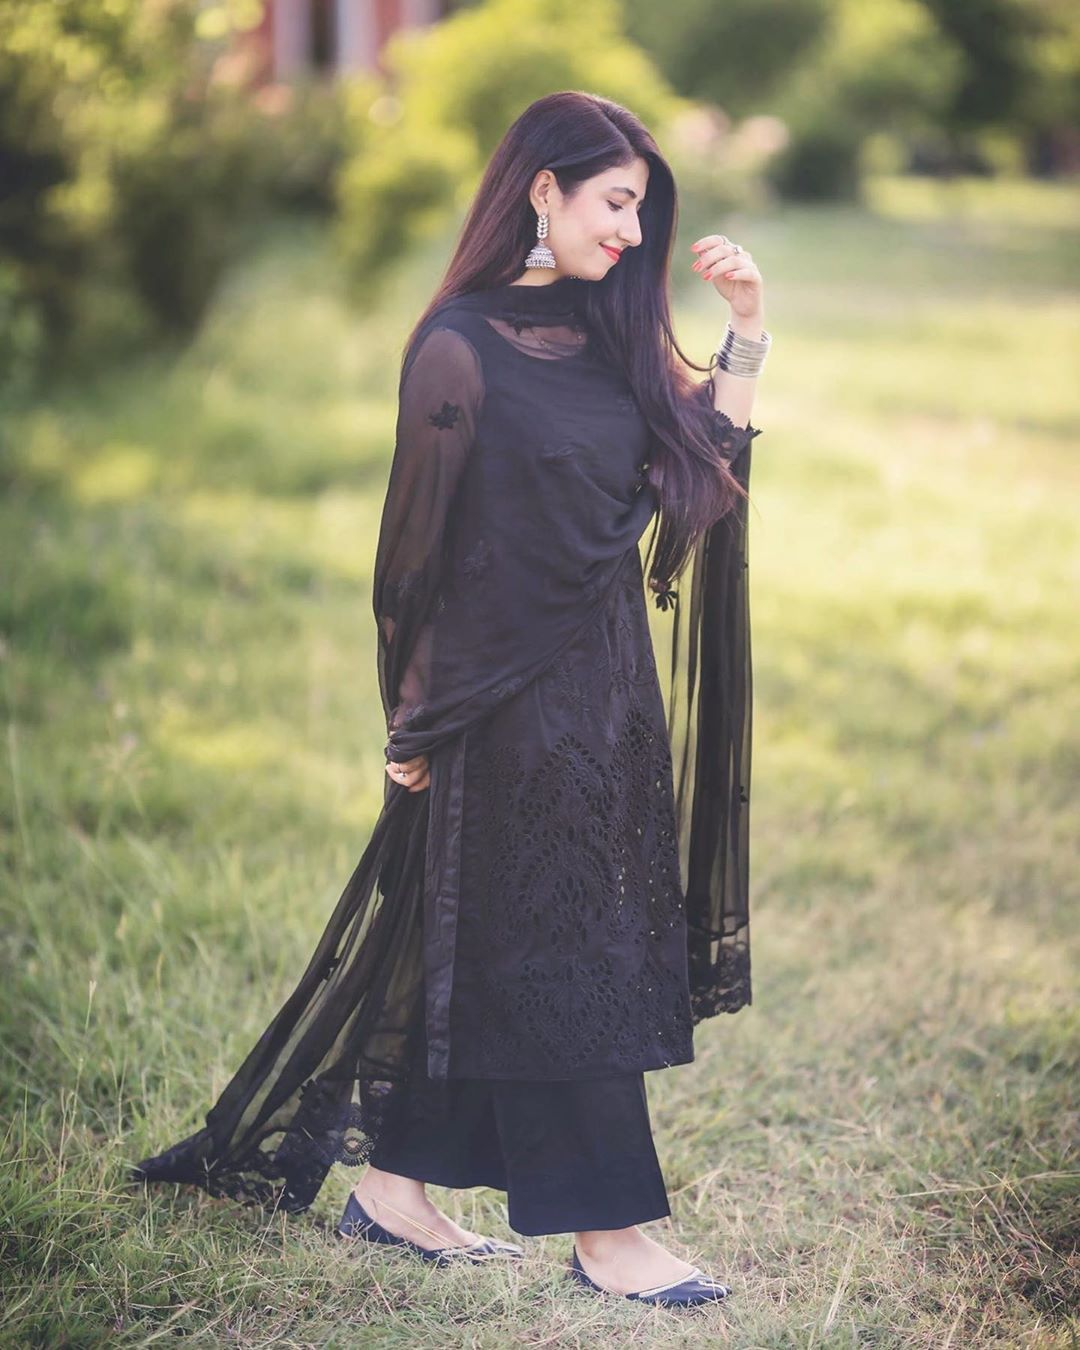 Maha Wajahat Khan Mahawajahatkhan Added A Photo To Their Instagram Account Blackismyhap Black Pakistani Dress Indian Fashion Dresses Velvet Dress Designs [ 1350 x 1080 Pixel ]